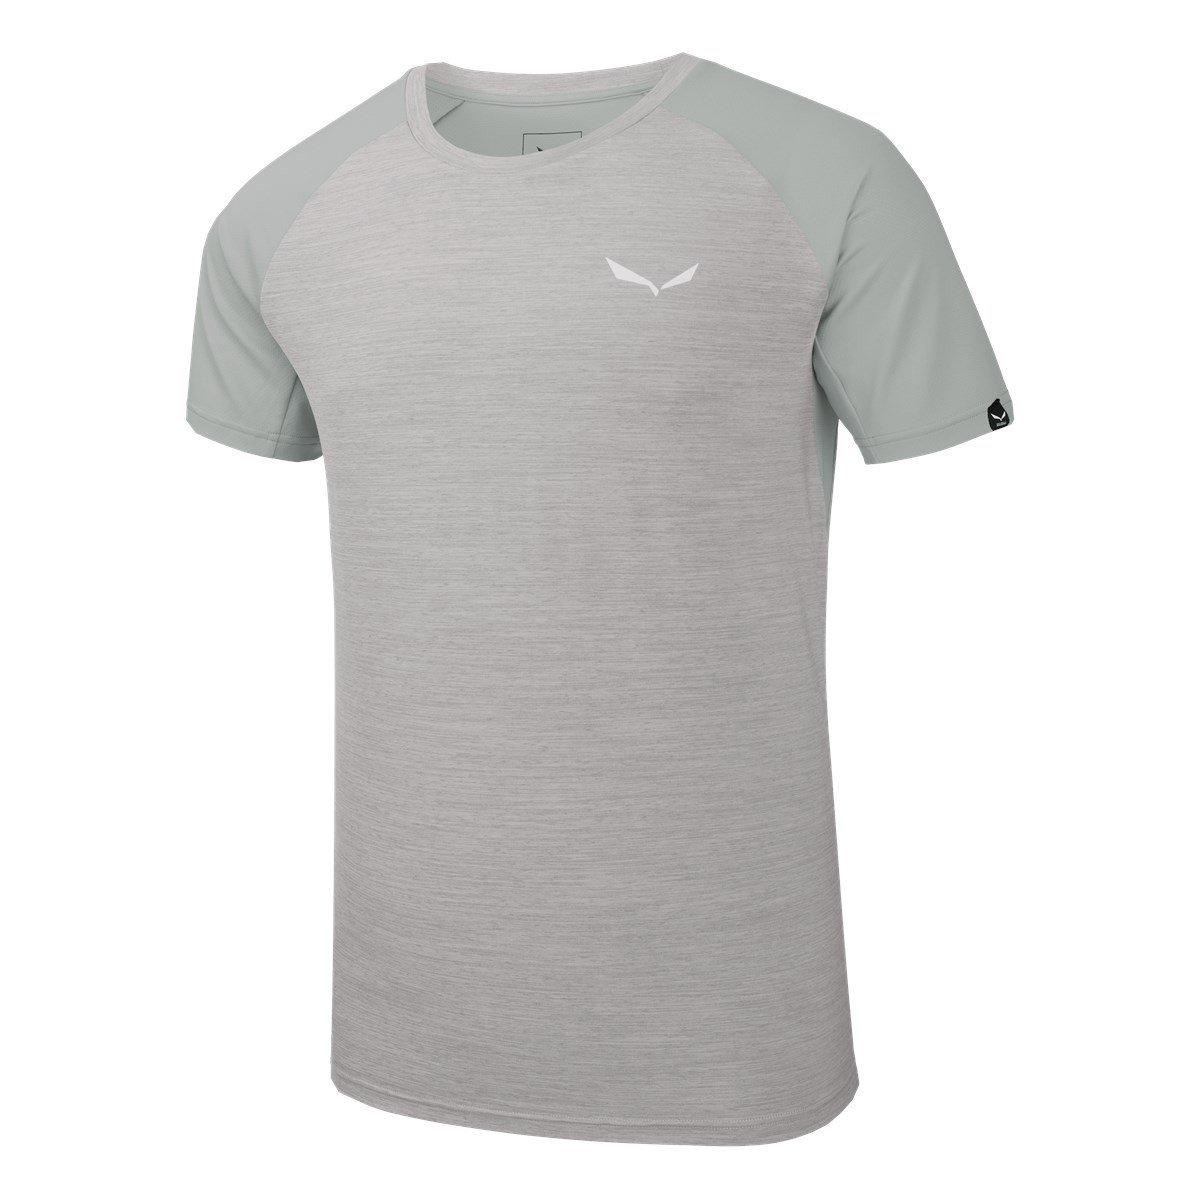 SALEWA Pedroc Hybrid Dry Camiseta de Manga Corta Hombre